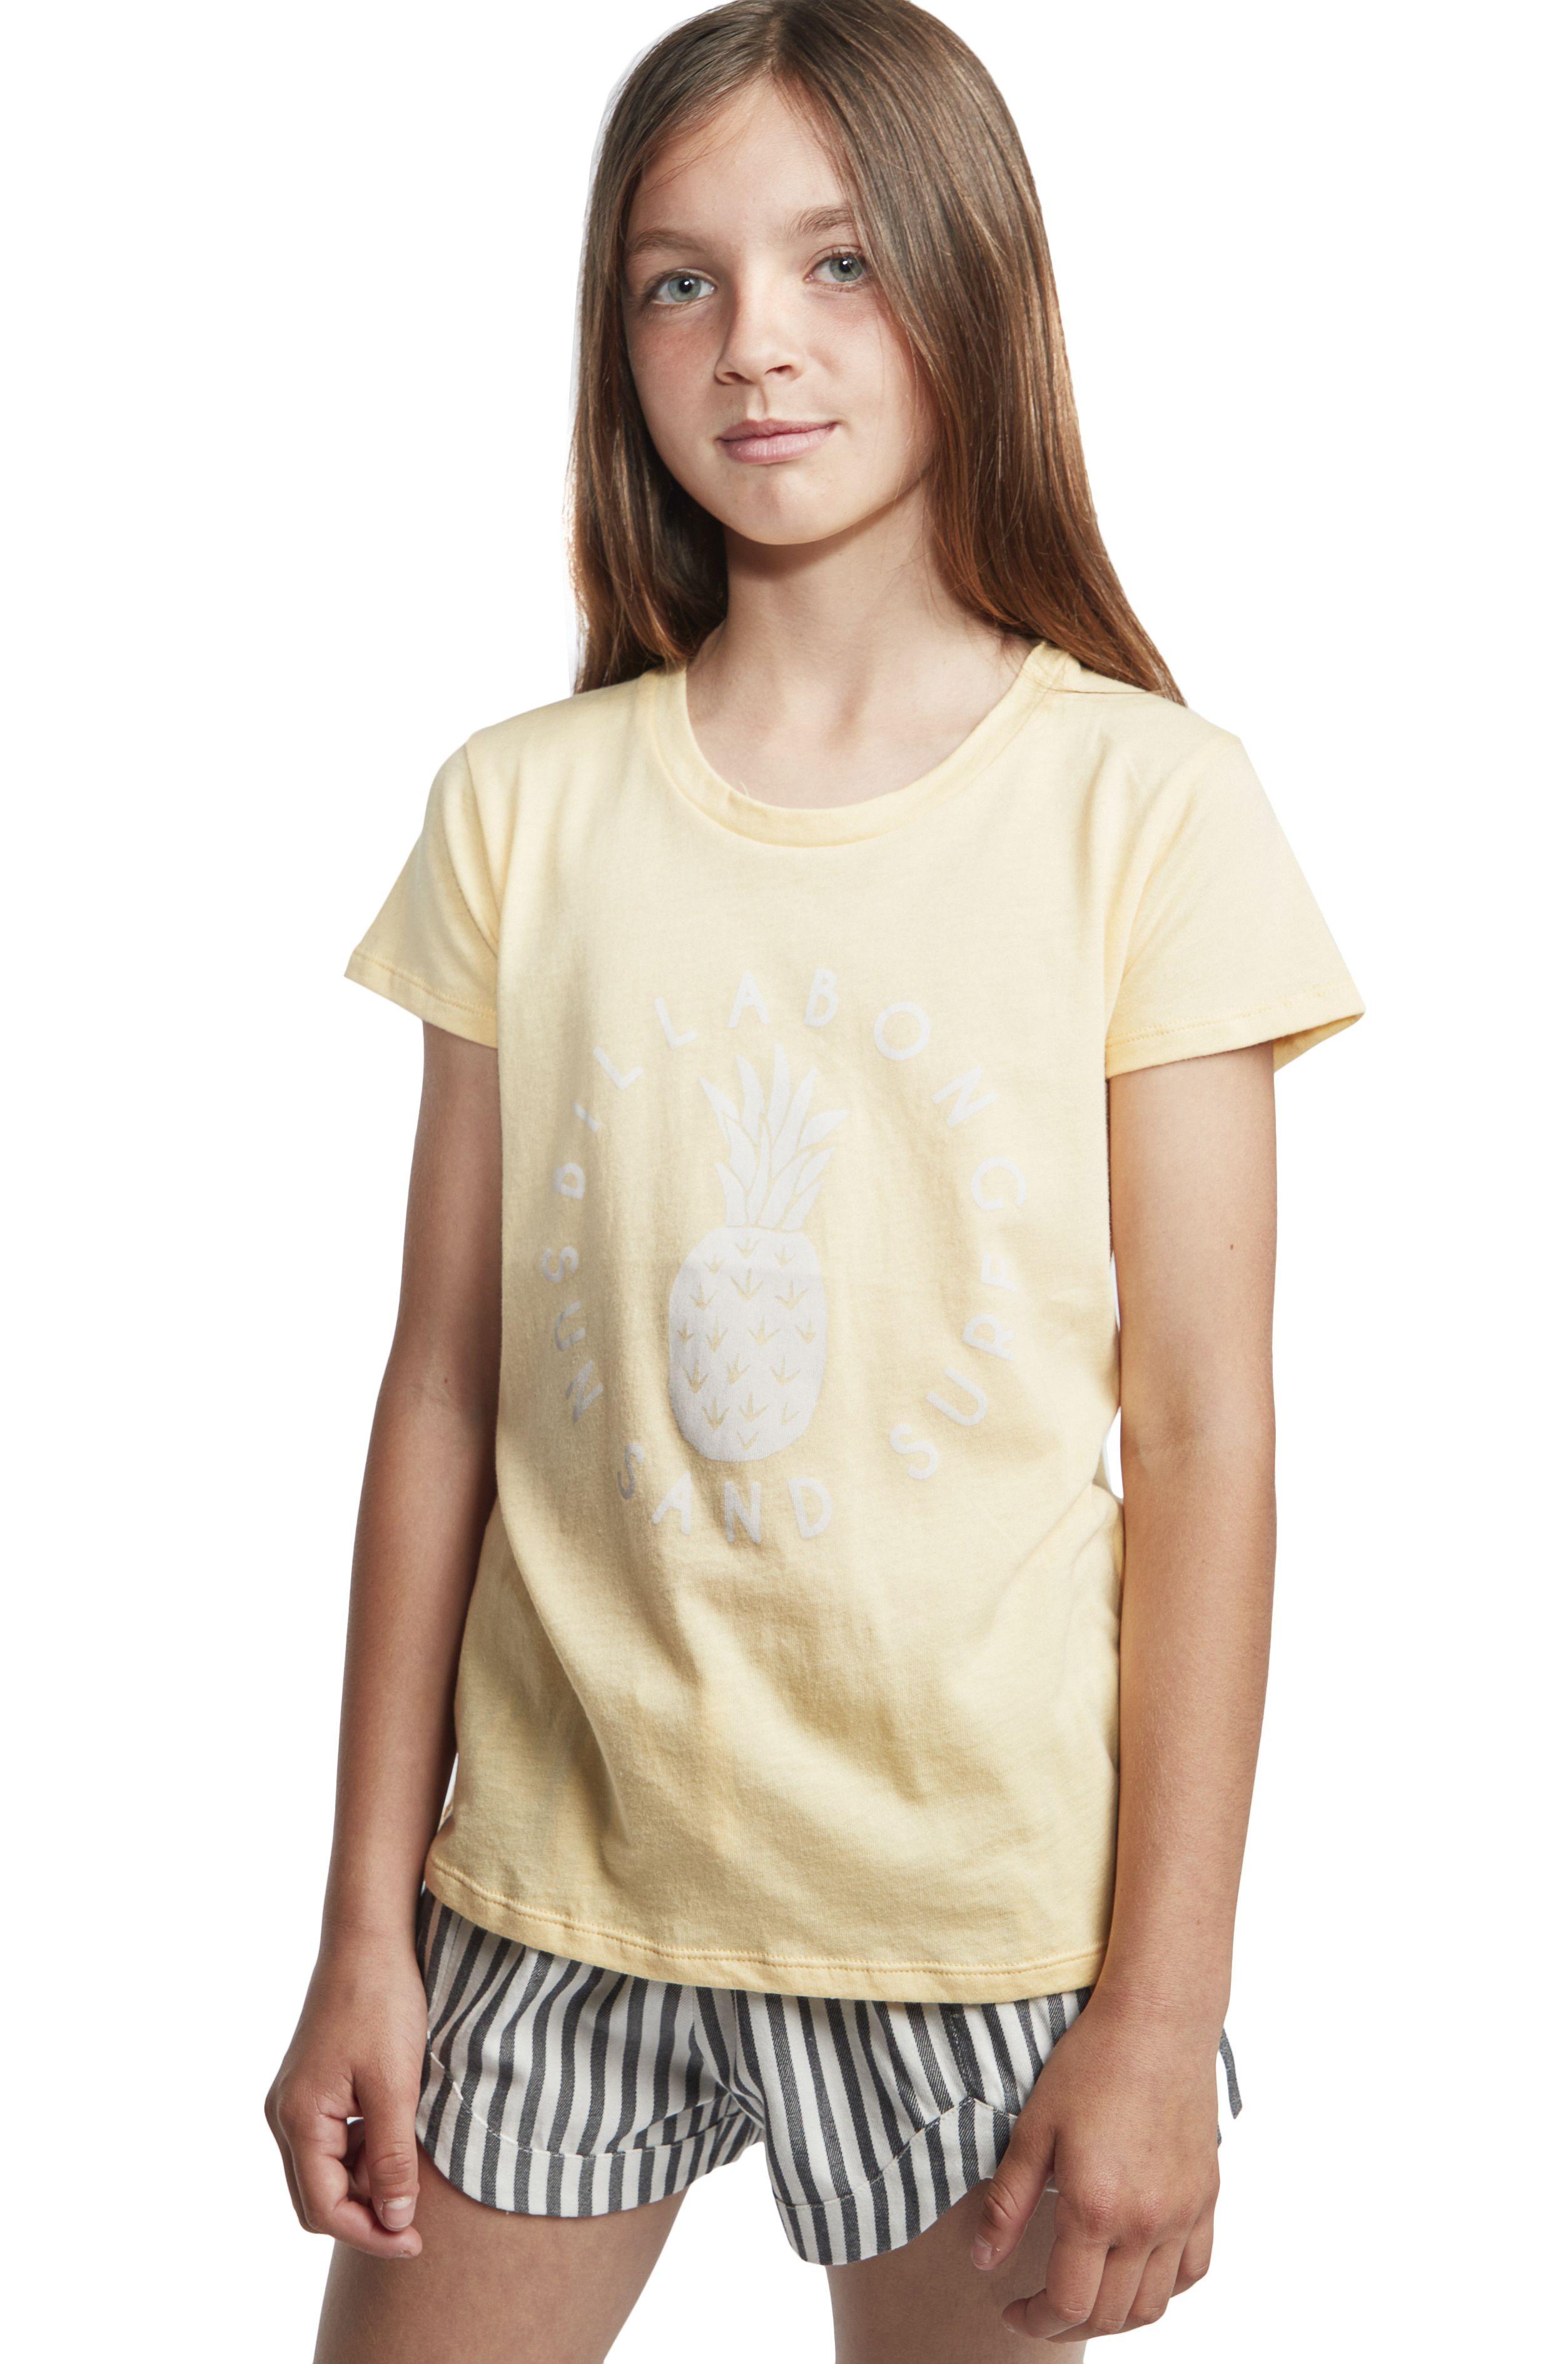 T-Shirt Billabong SAND AND SURF Canary Yellow